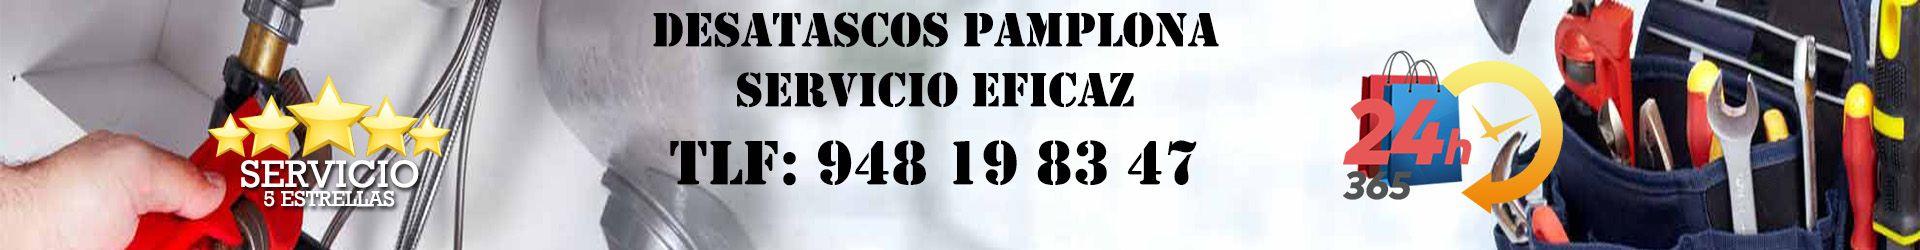 Desatascos Pamplona